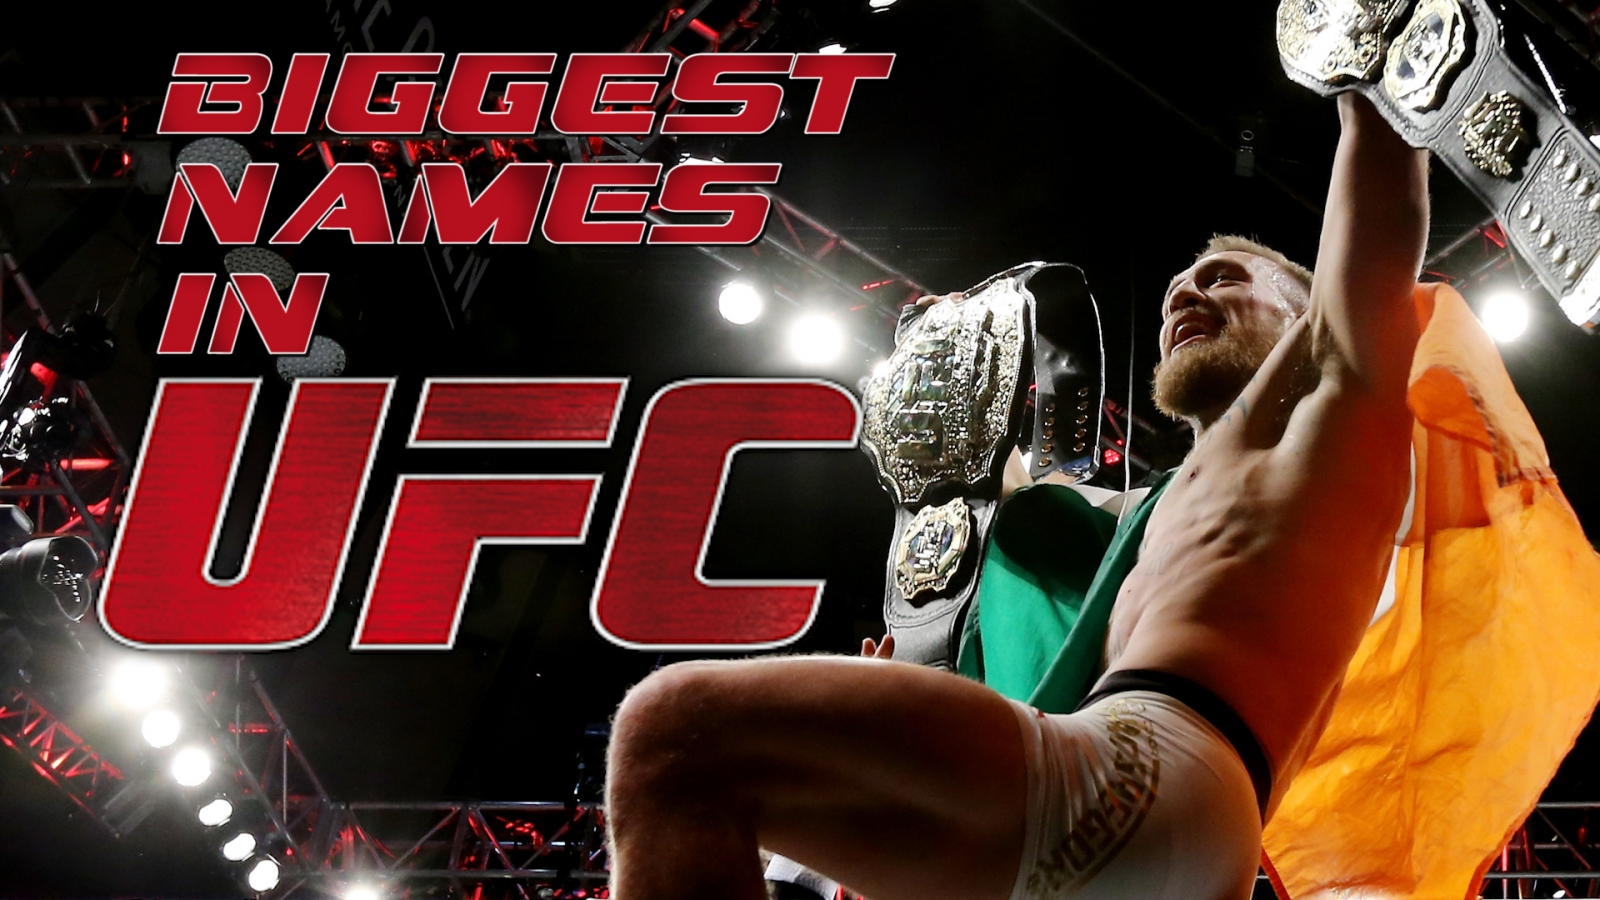 Biggest names in UFC